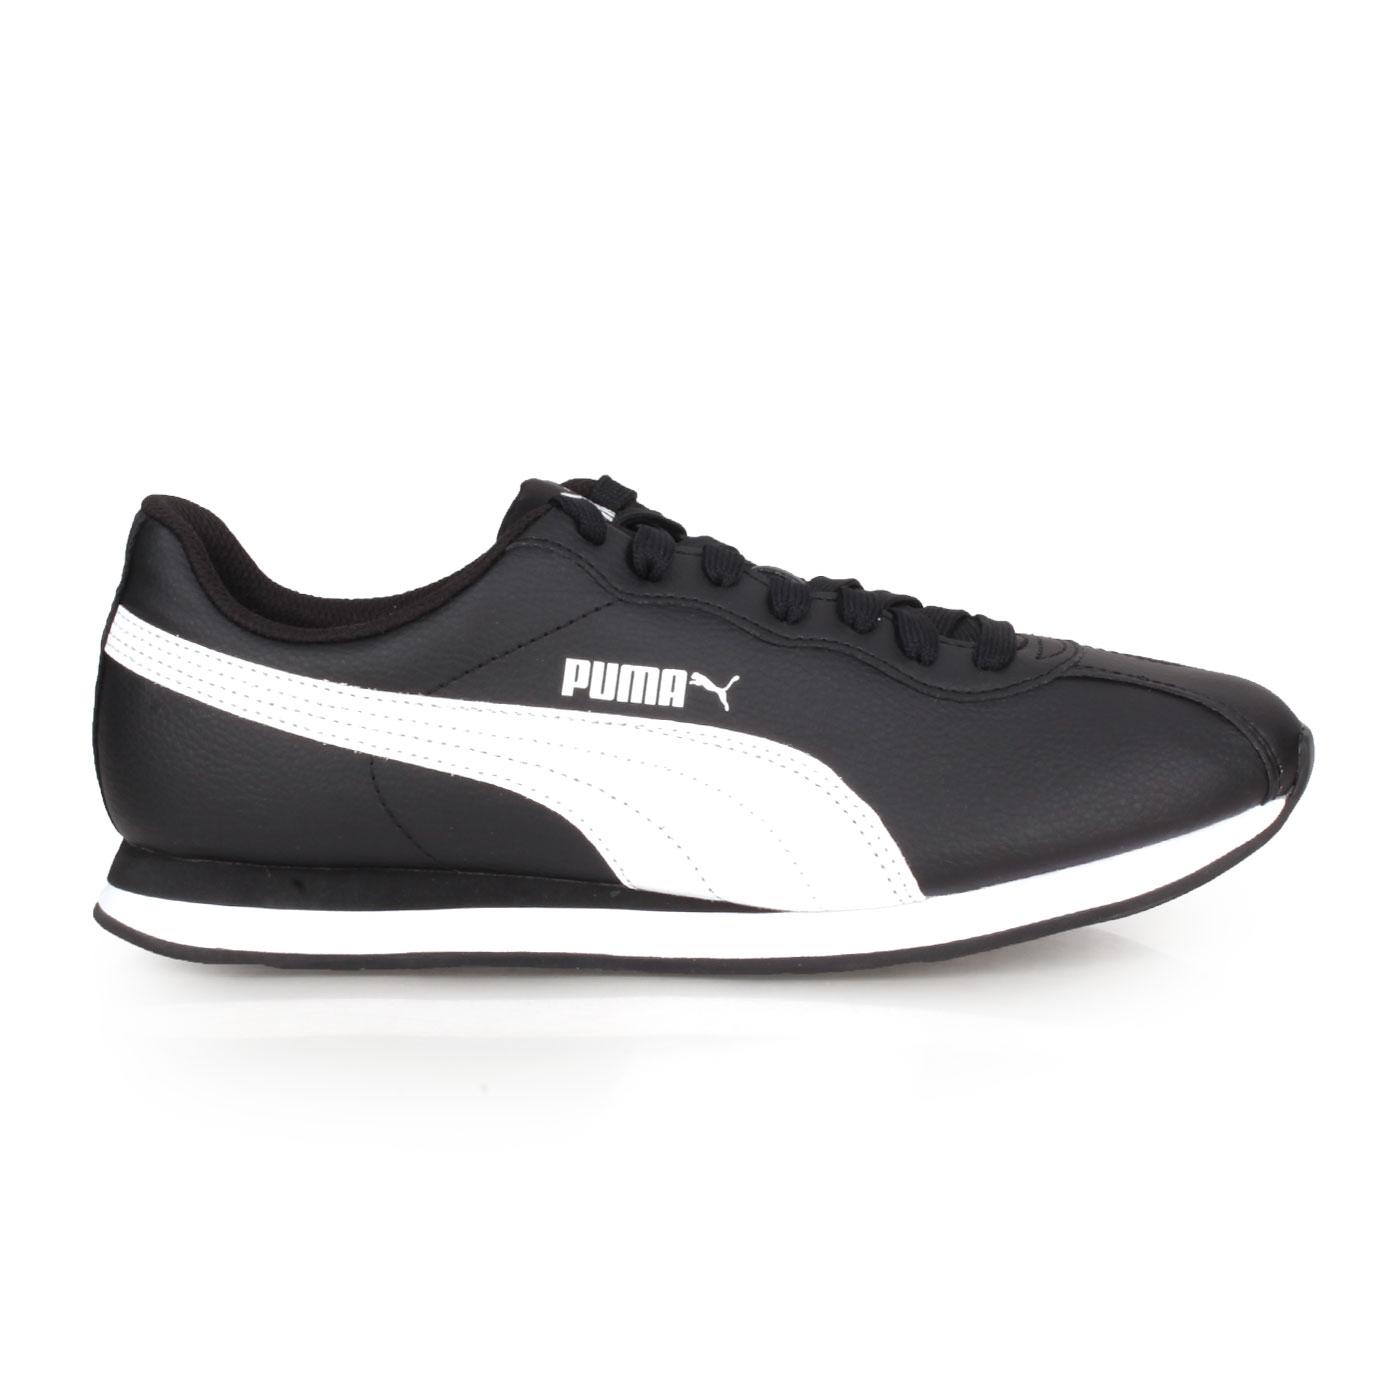 PUMA 休閒運動鞋  @Turin II@36696201 - 黑白